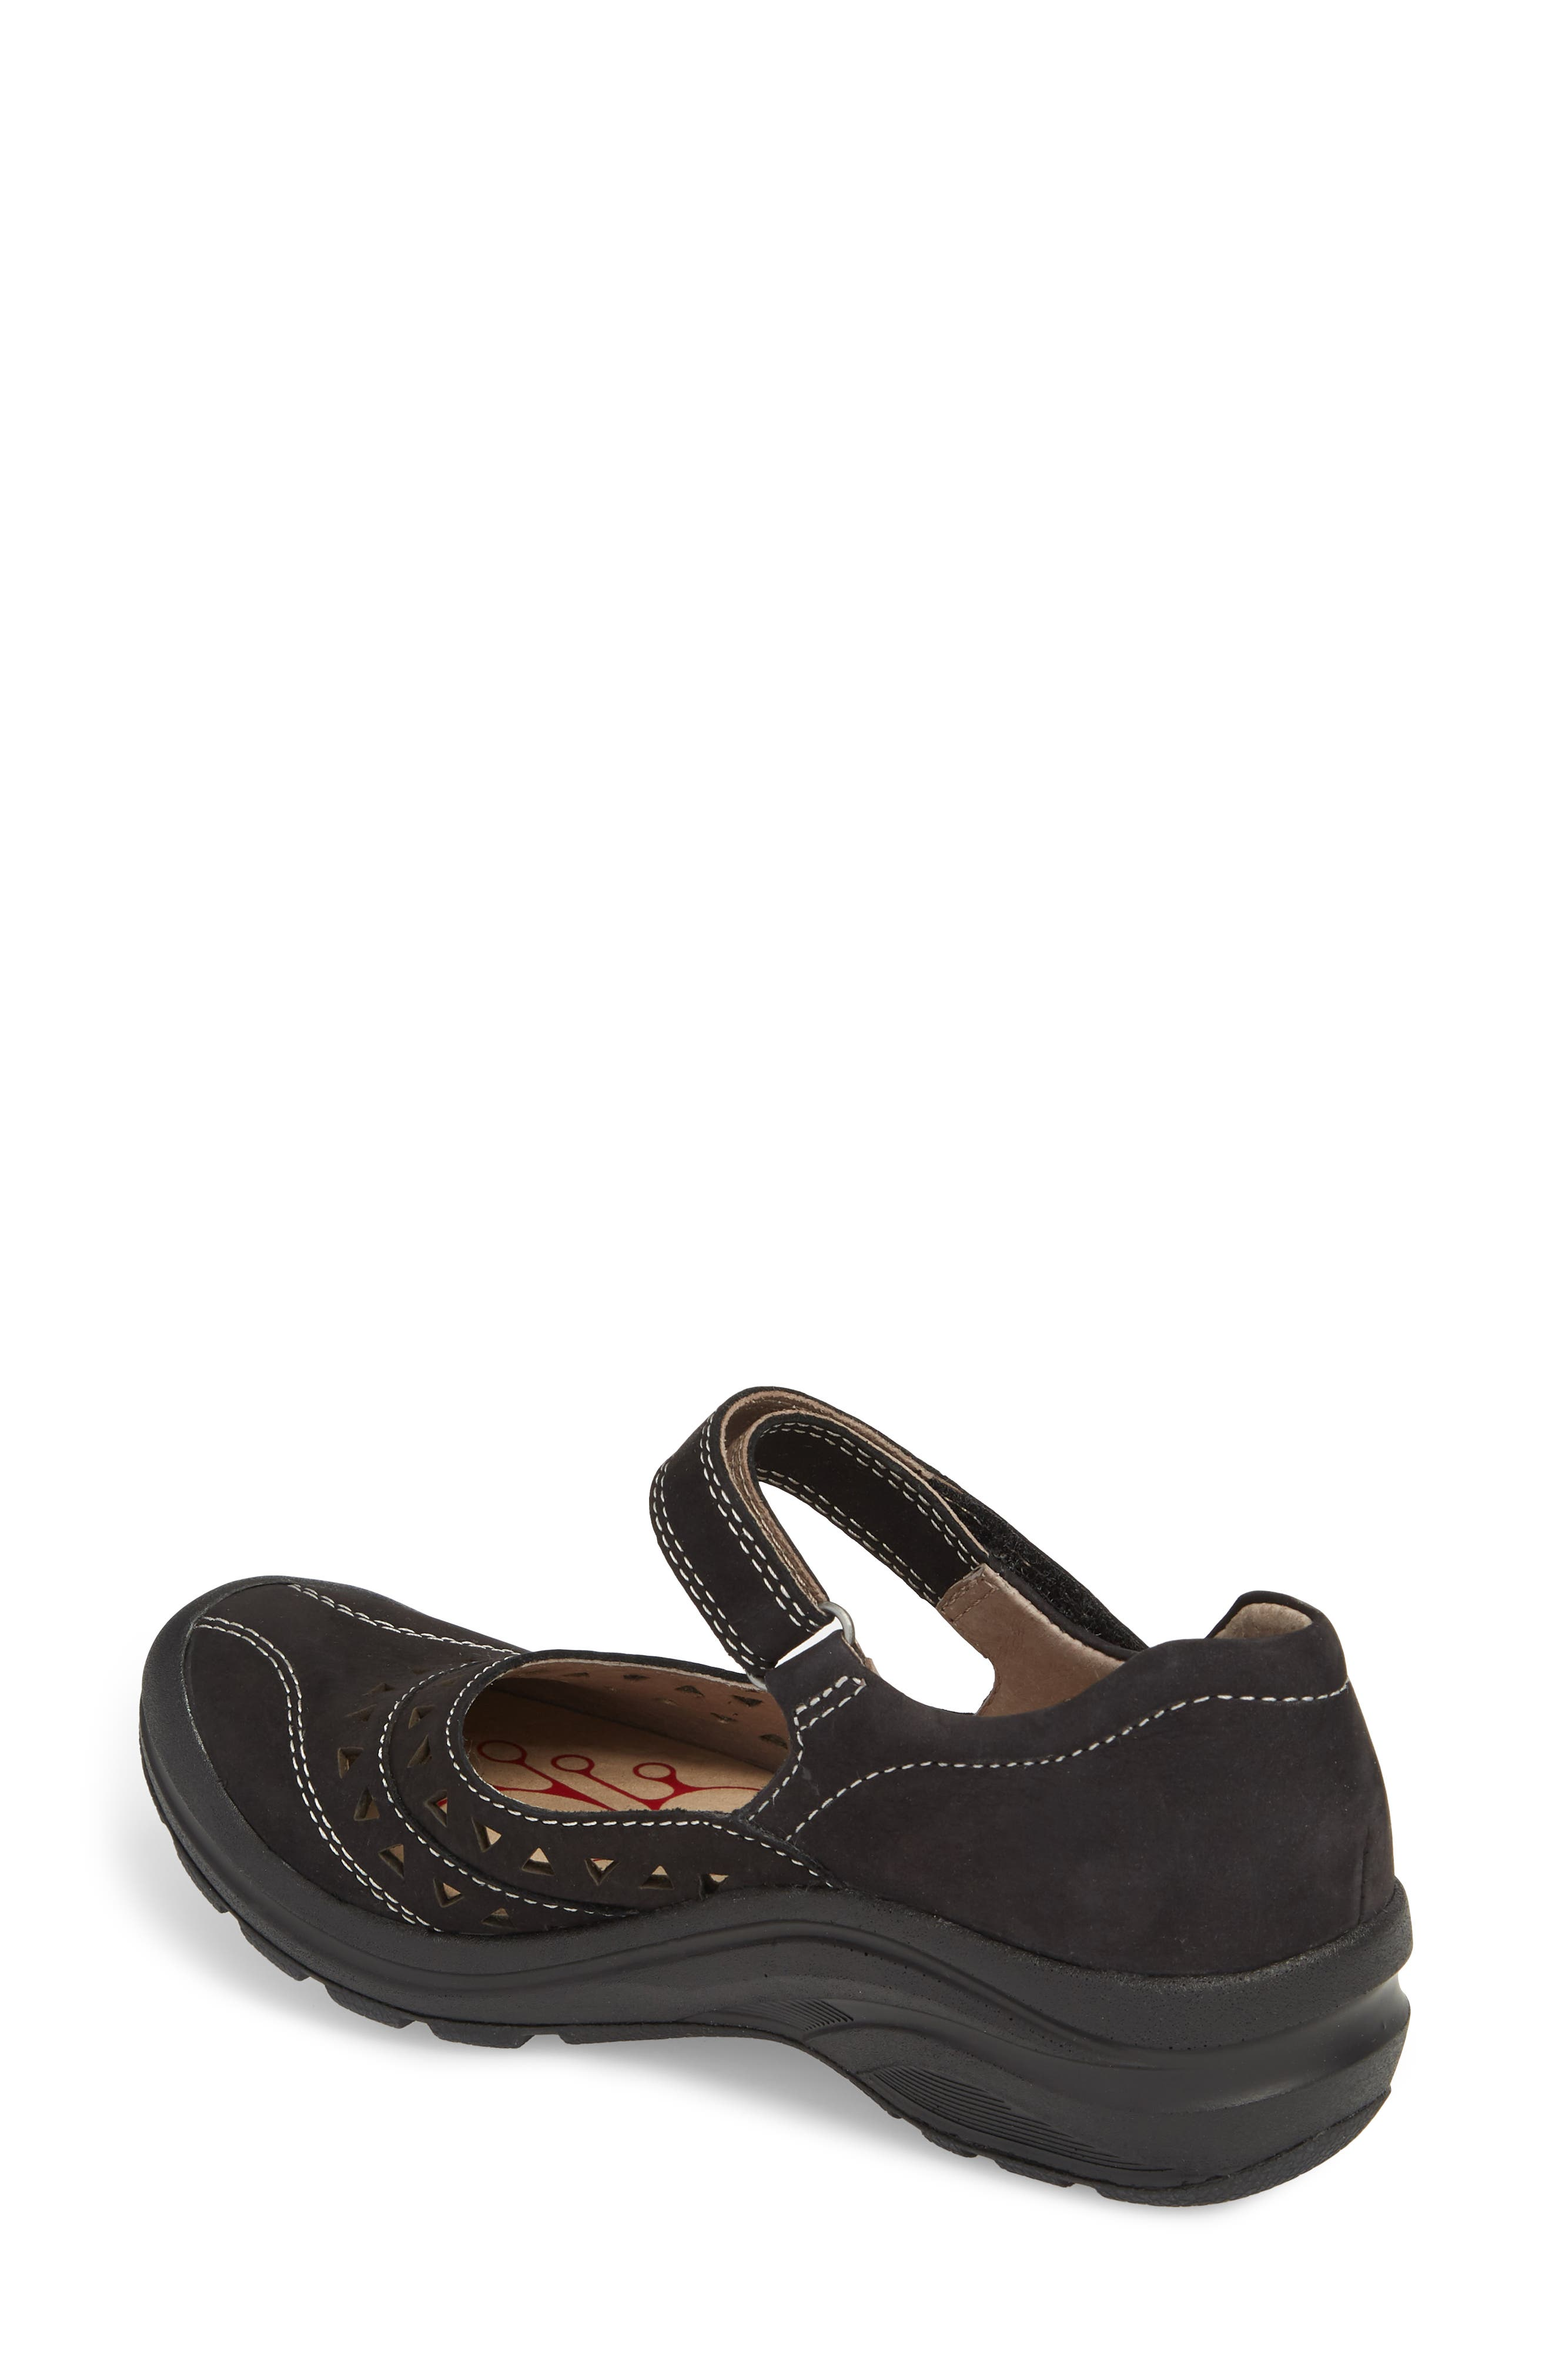 Matia Mary Jane Sneaker,                             Alternate thumbnail 2, color,                             BLACK LEATHER